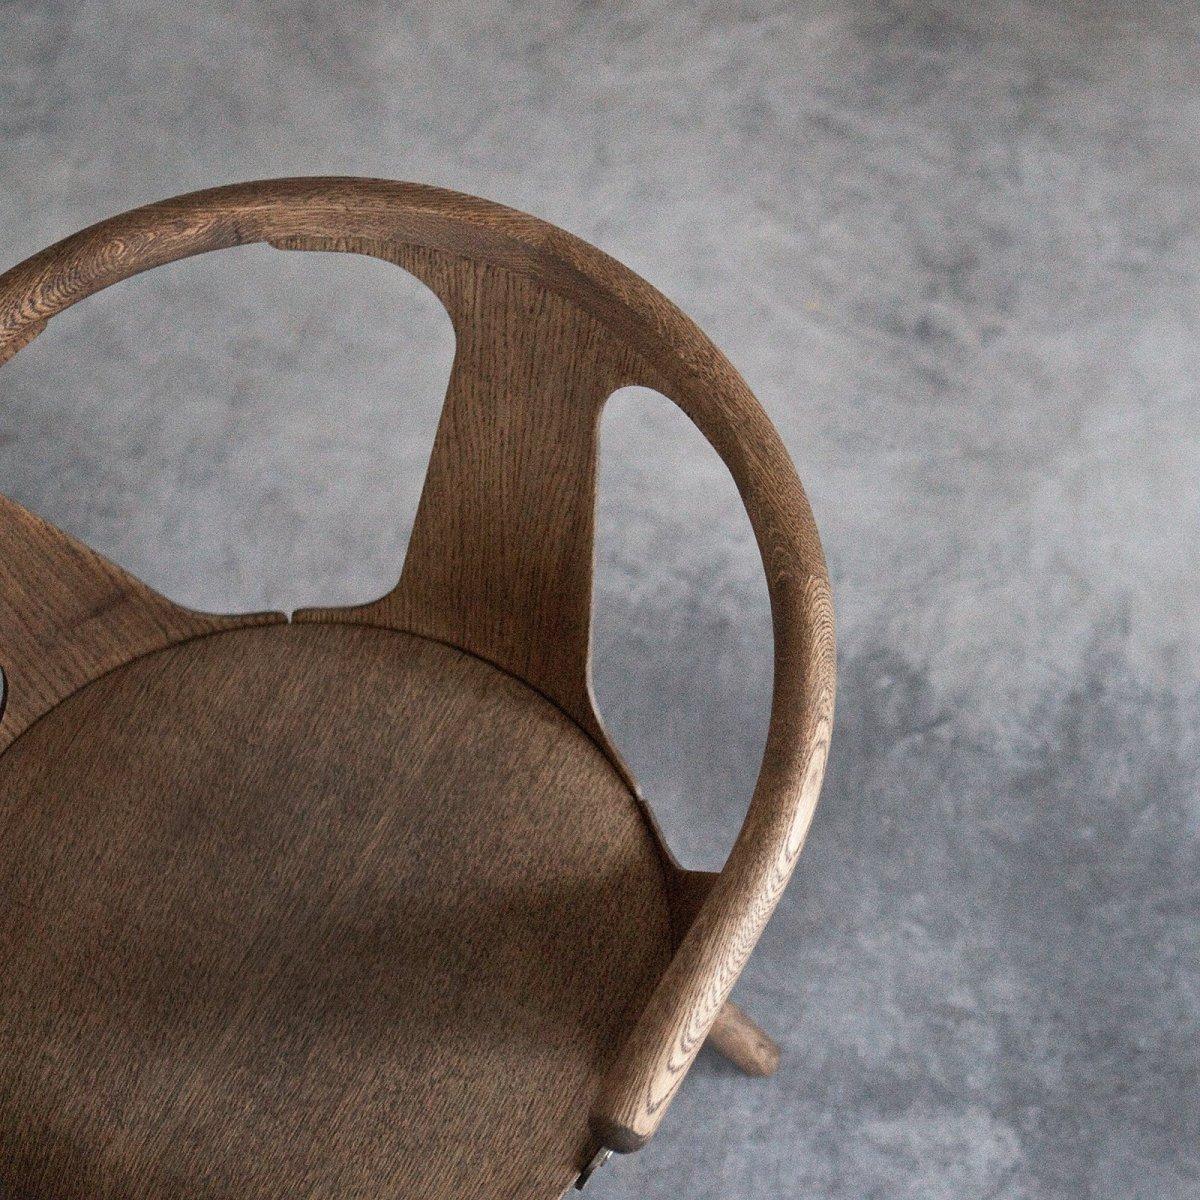 In Between Chair SK1, smoked oiled oak, top view.